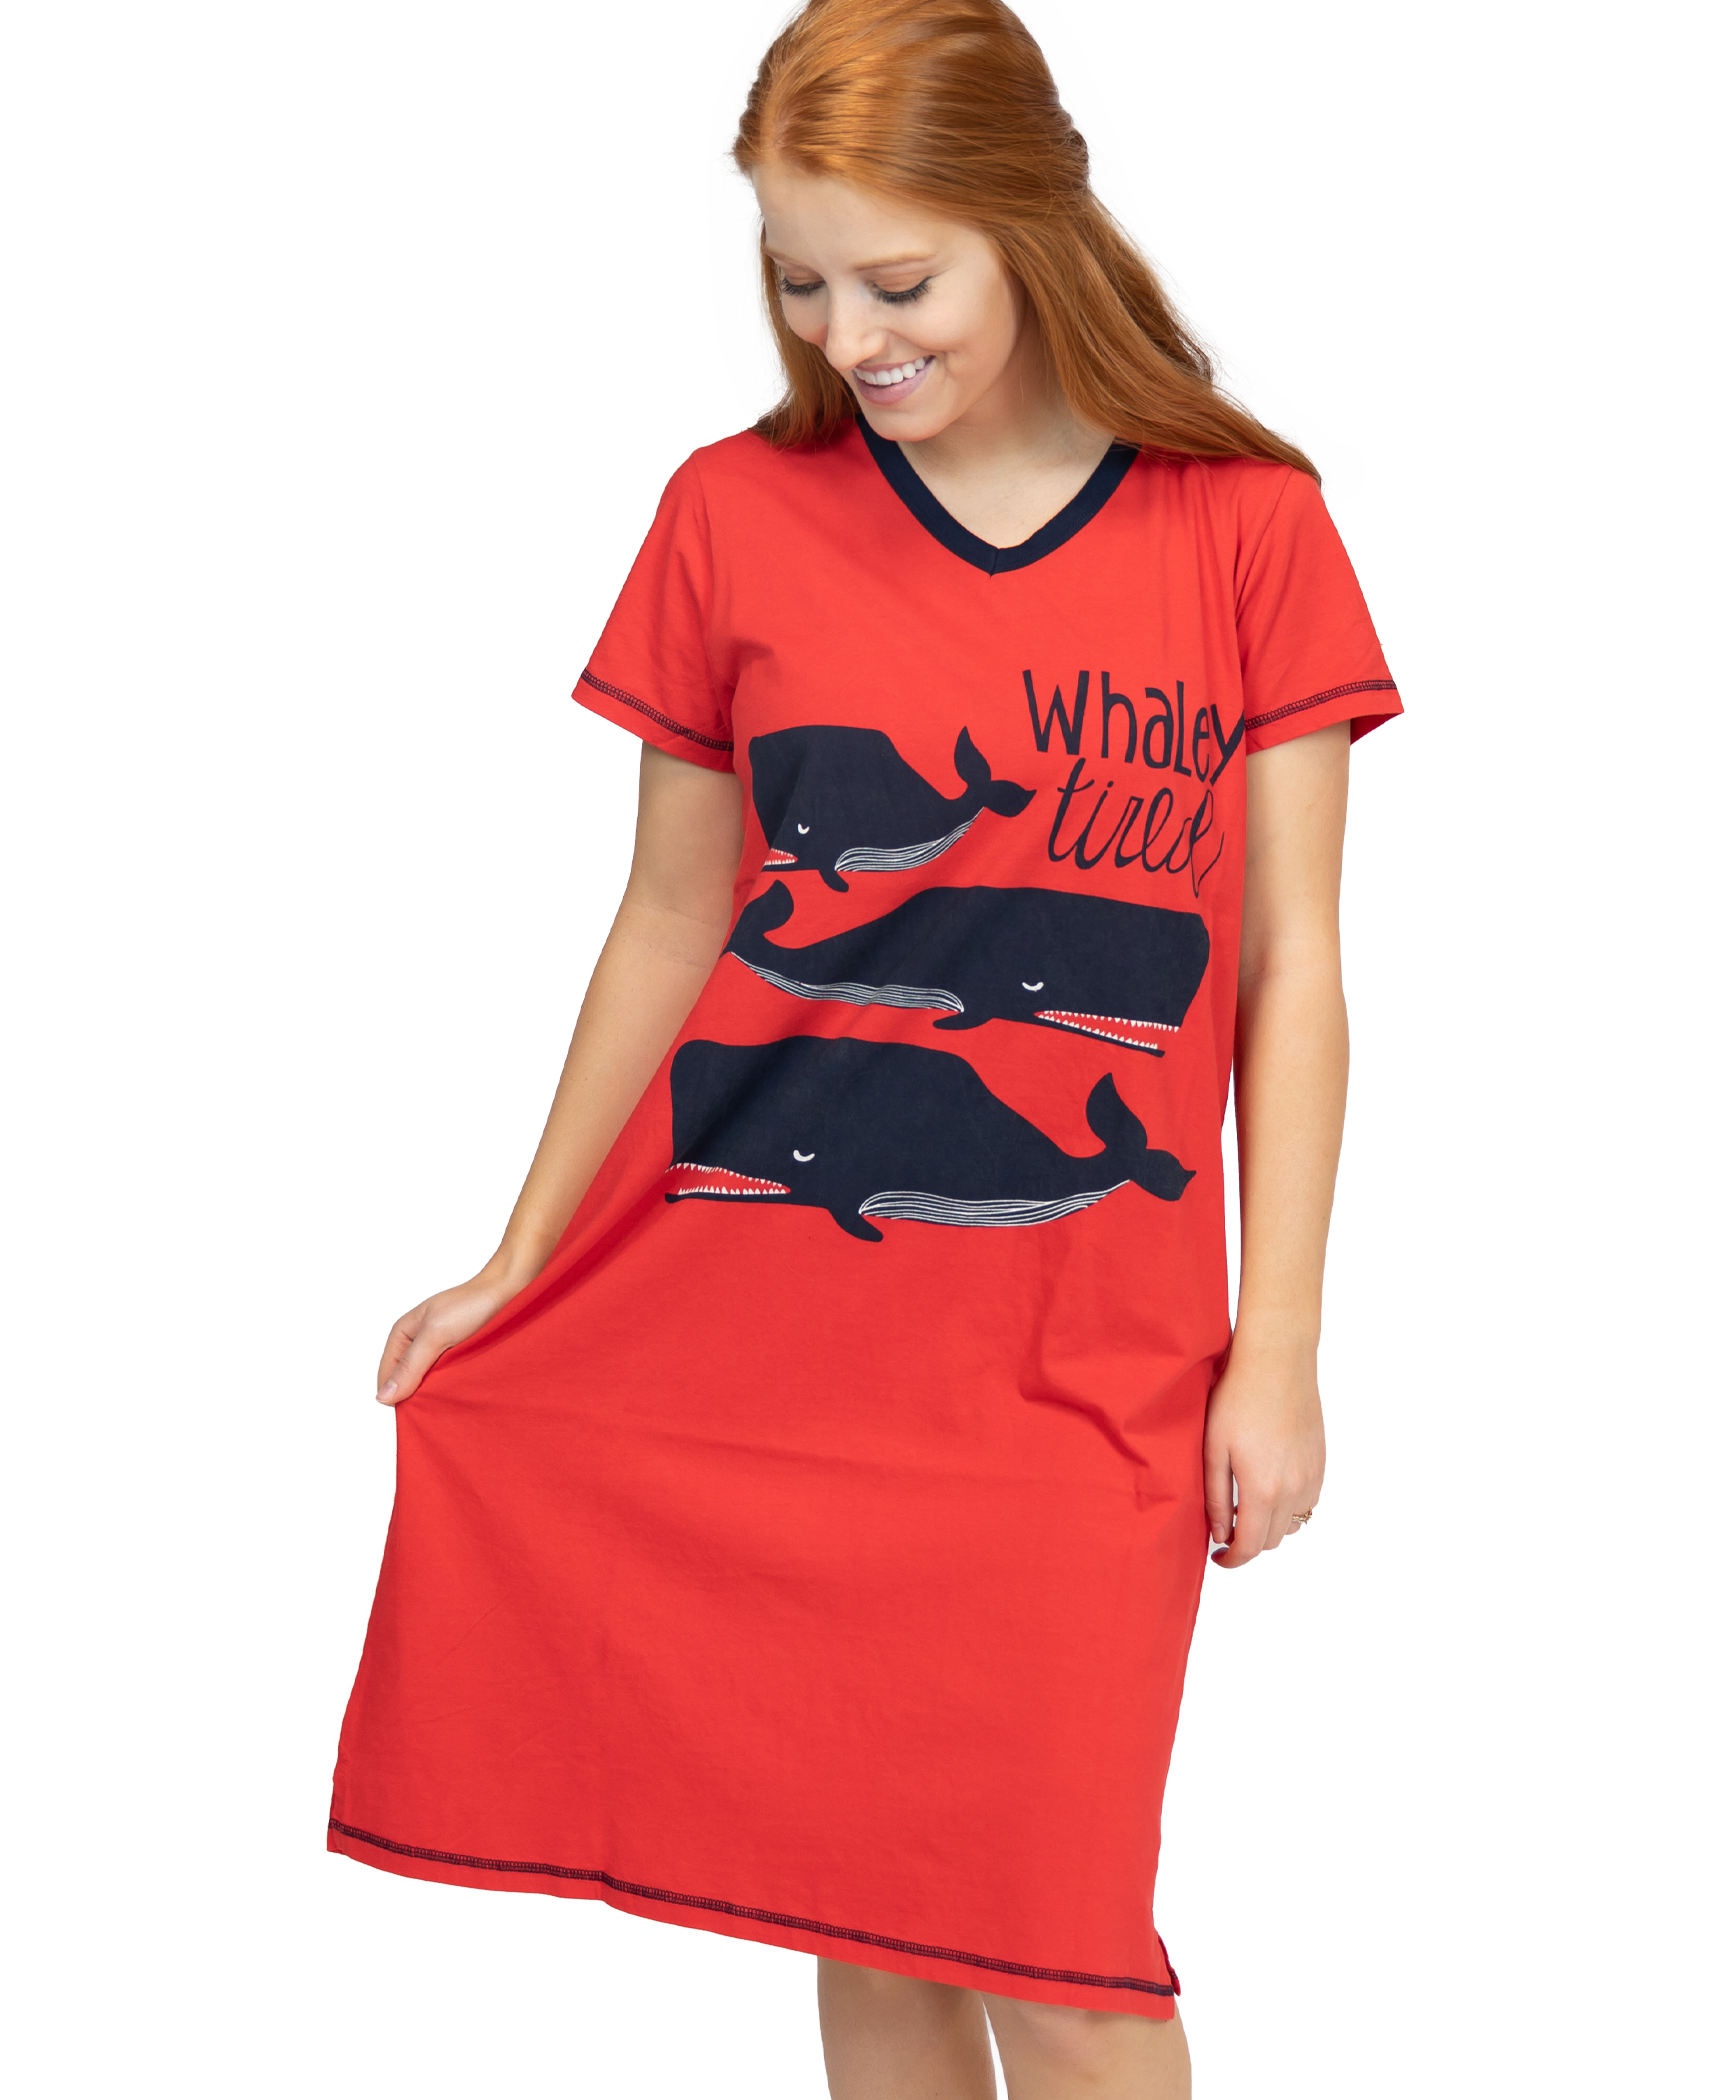 LazyOne Womens Whaley Tired Nightshirt V Neck